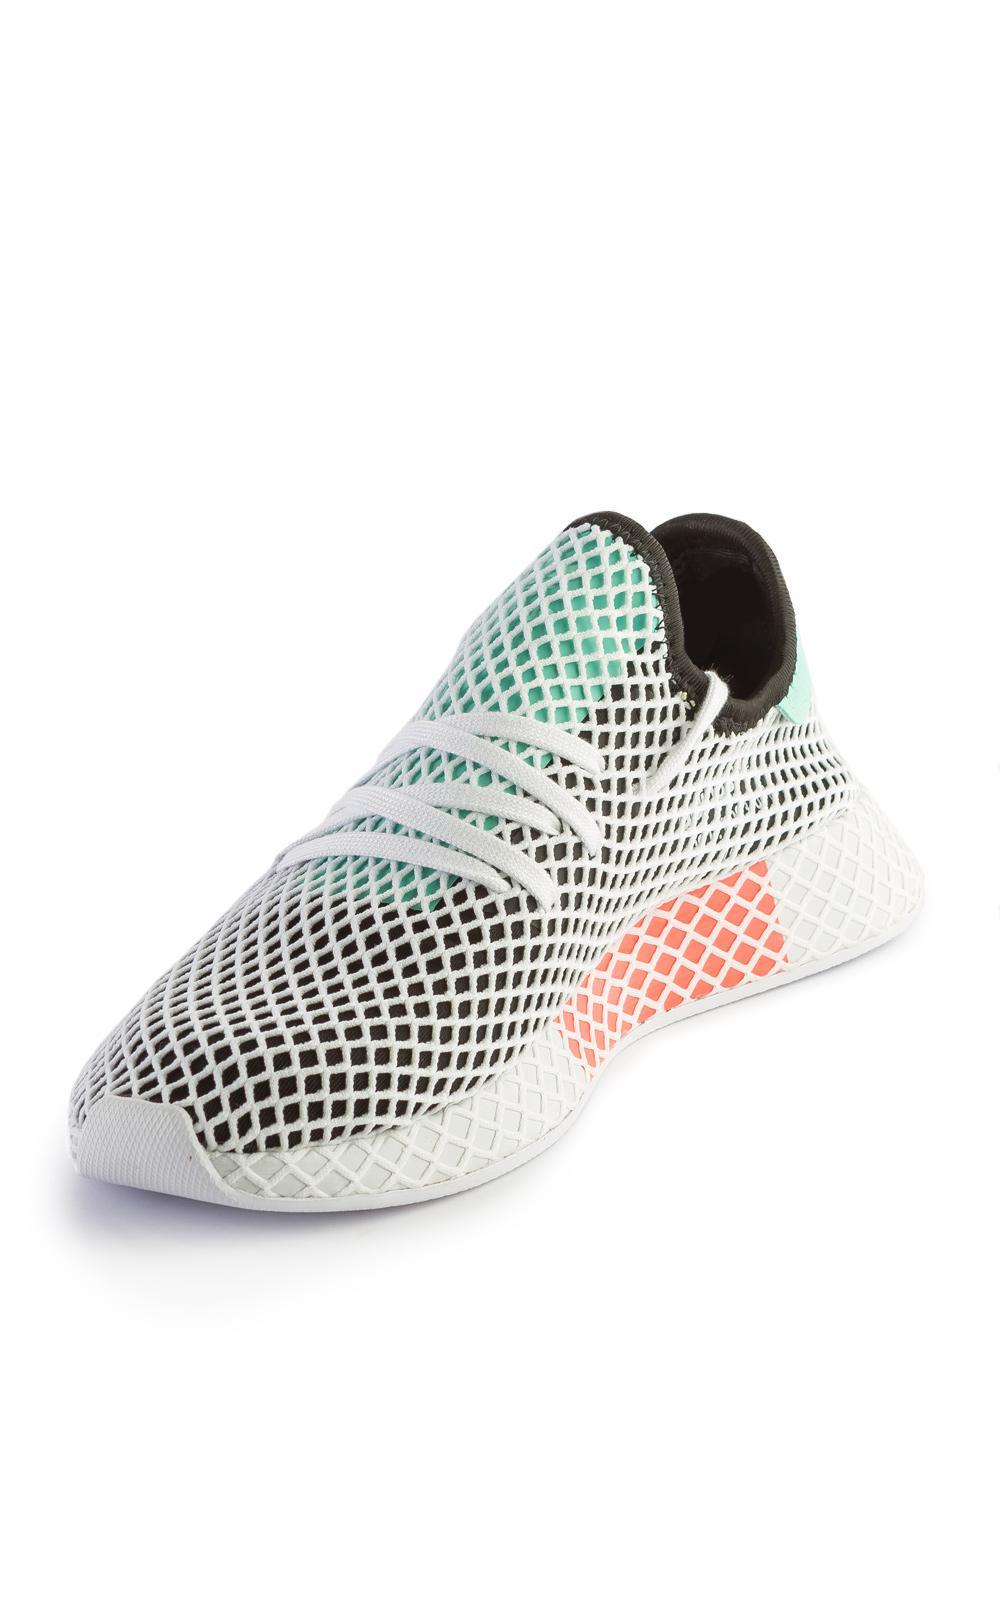 2d9aebe95 adidas Originals Deerupt Runner Core Black easy Green in Black for ...